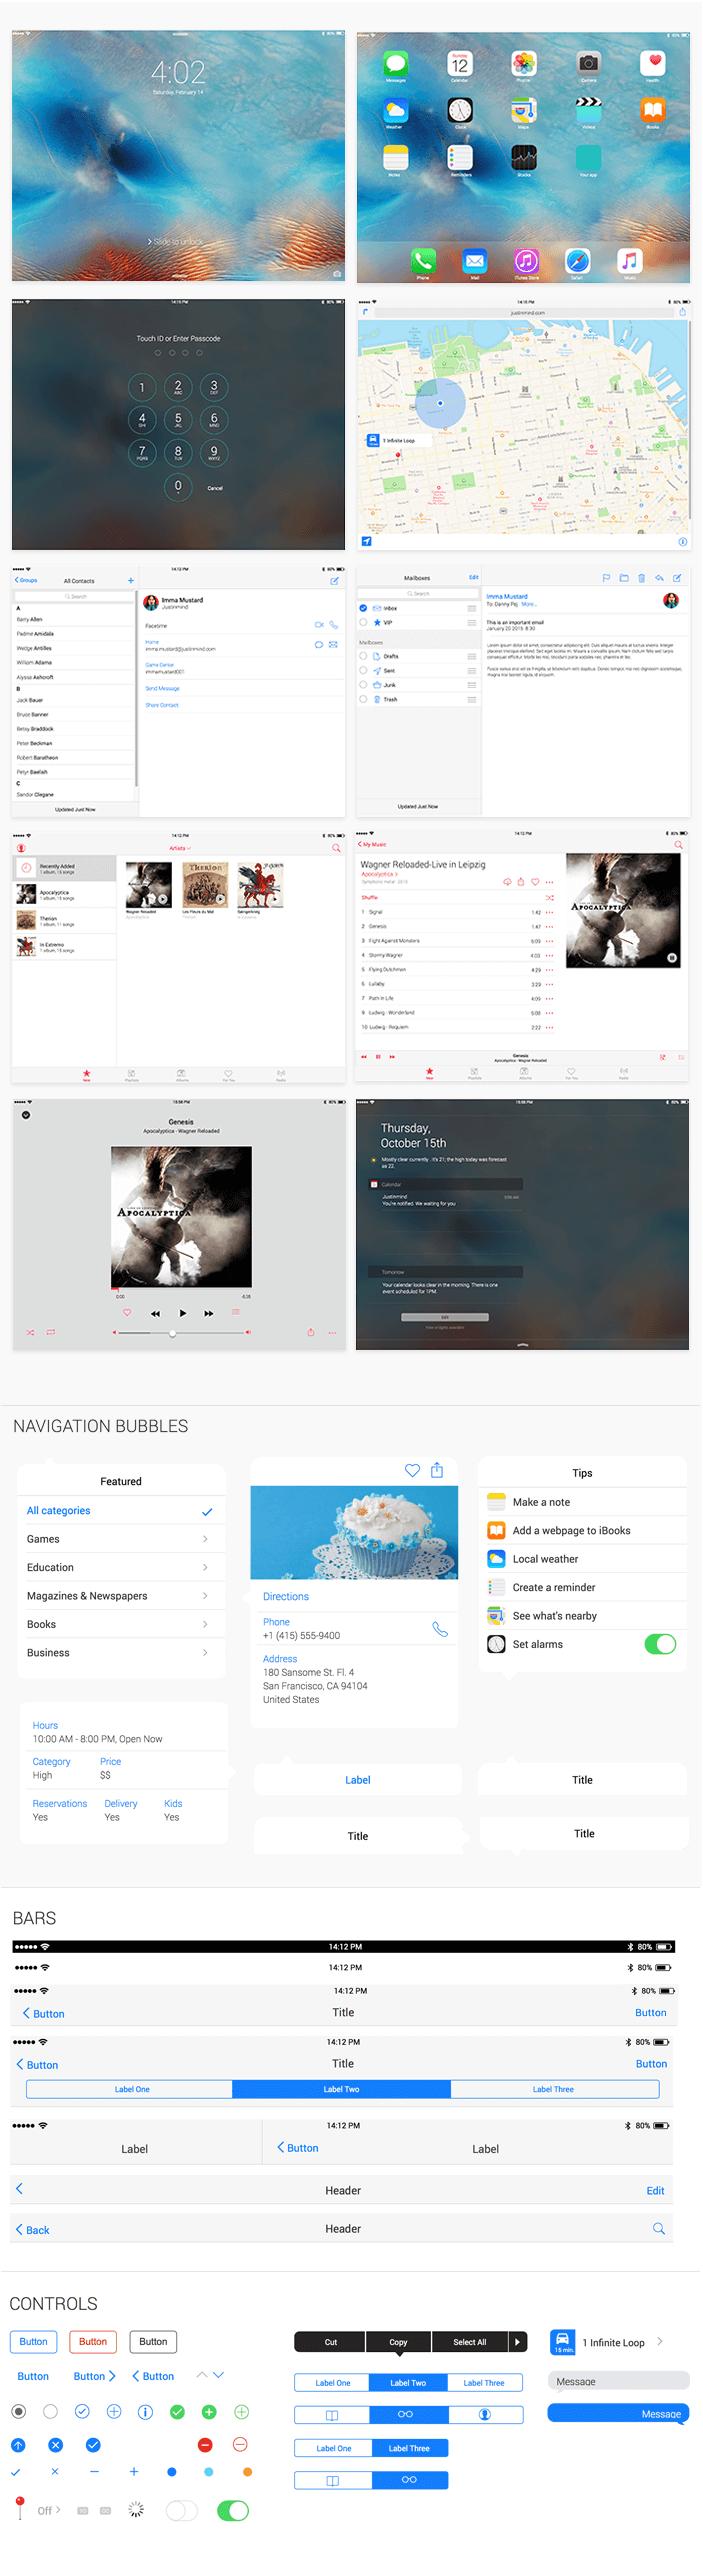 iPad-ui-kit-justinmind-new-release-2